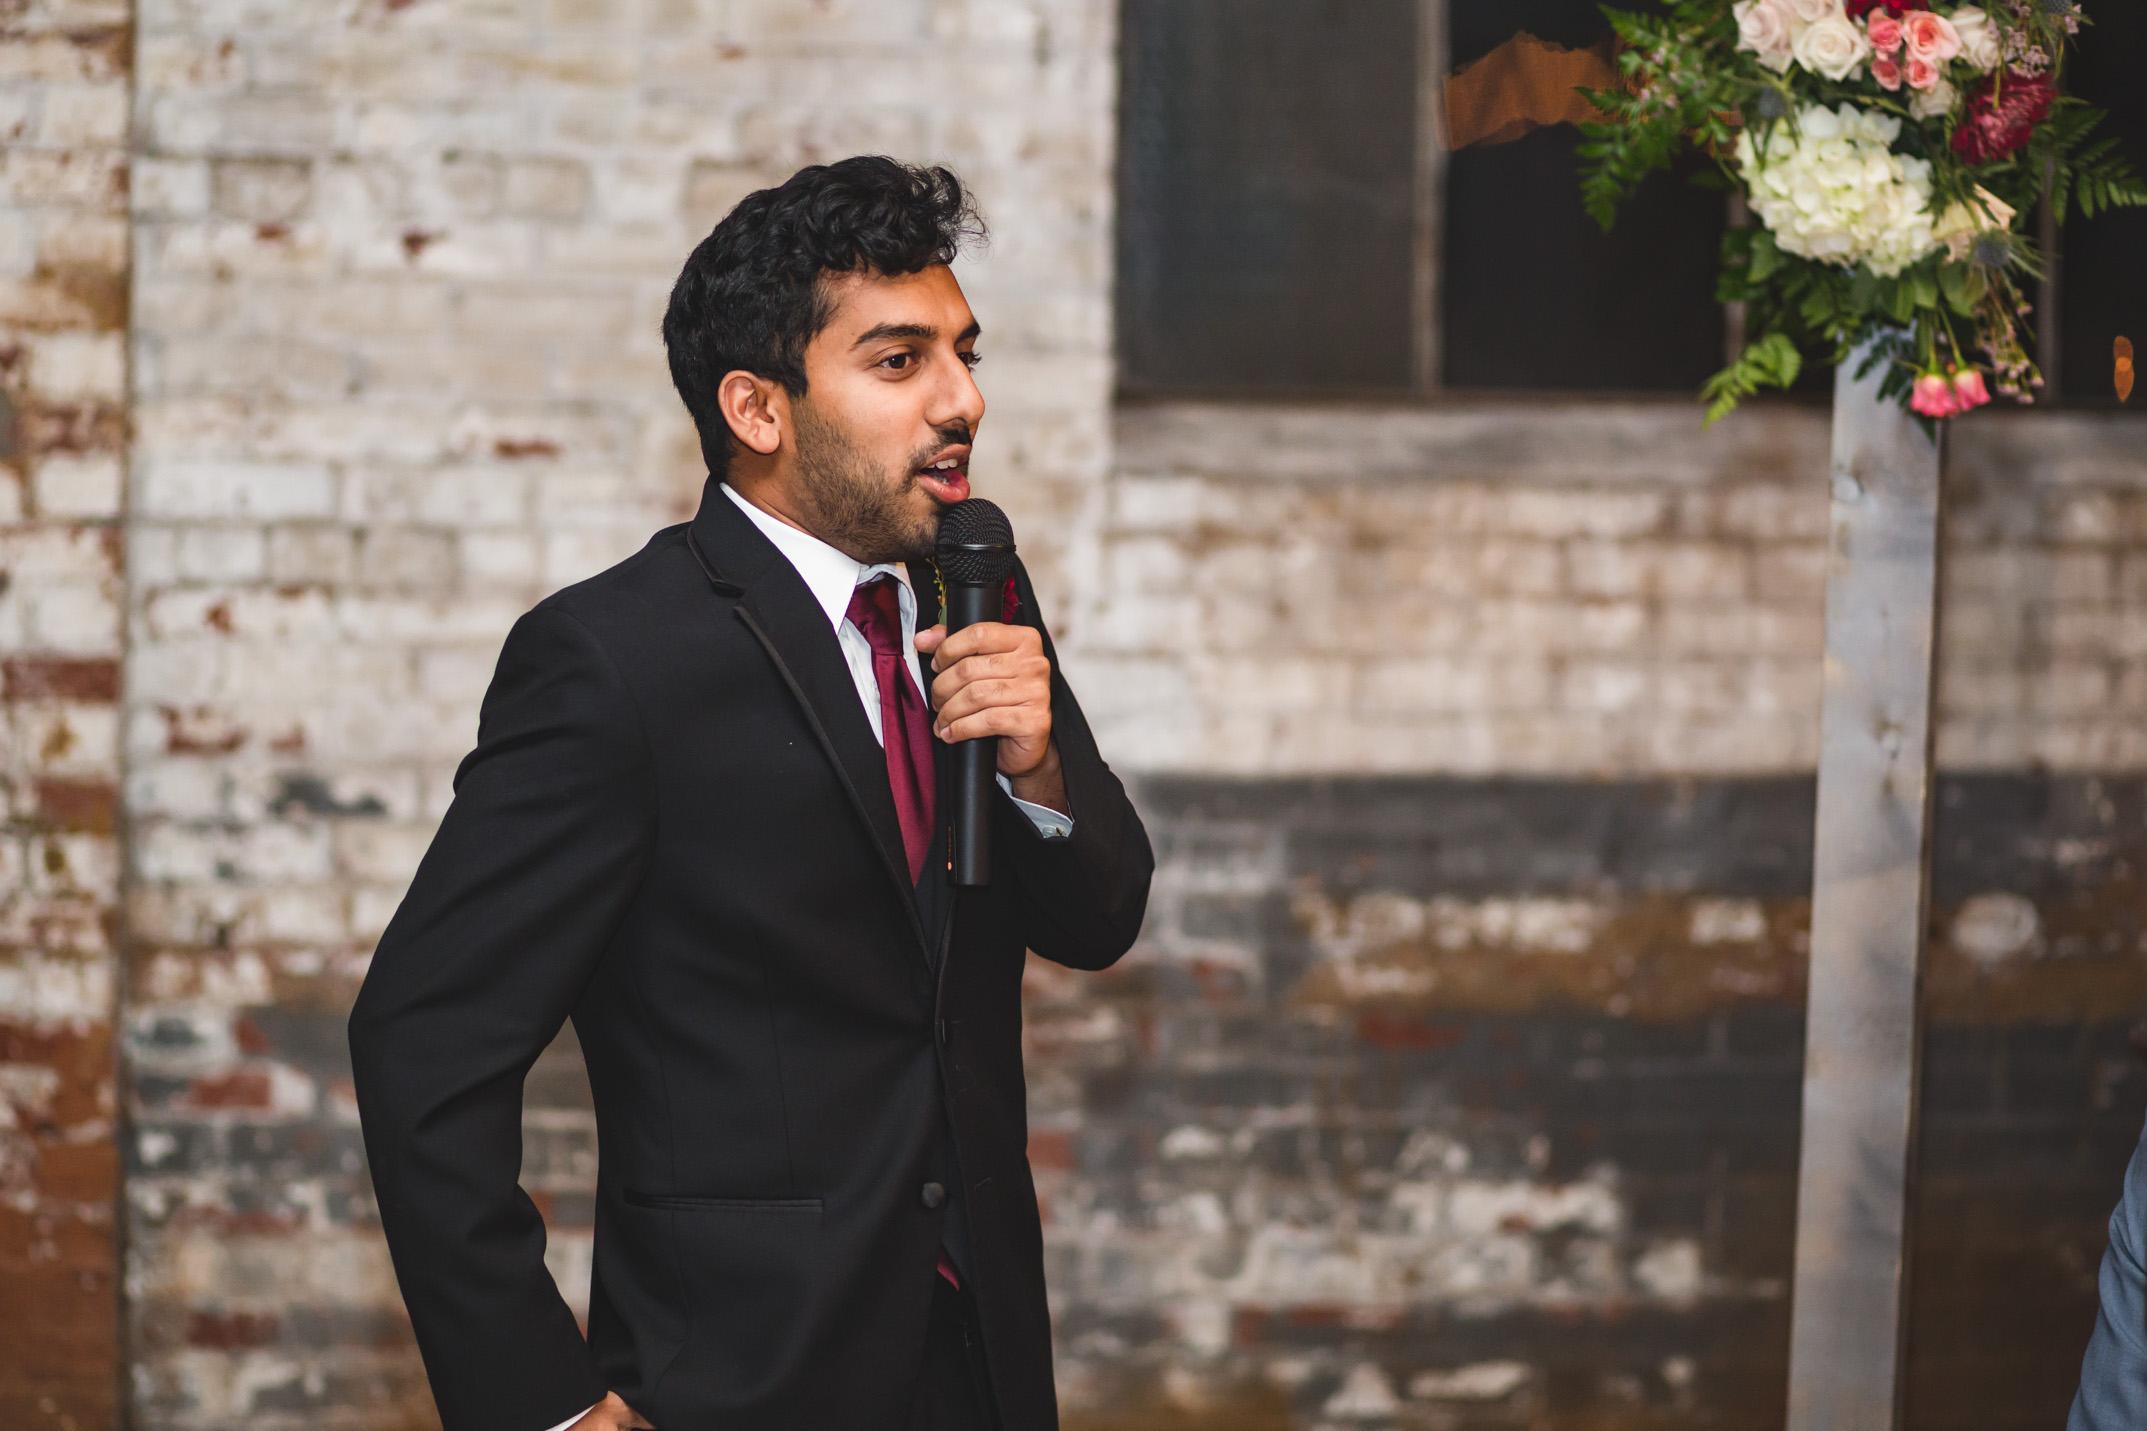 Adam-Szrmack-The-Glass-Factory-Wedding-150.jpg